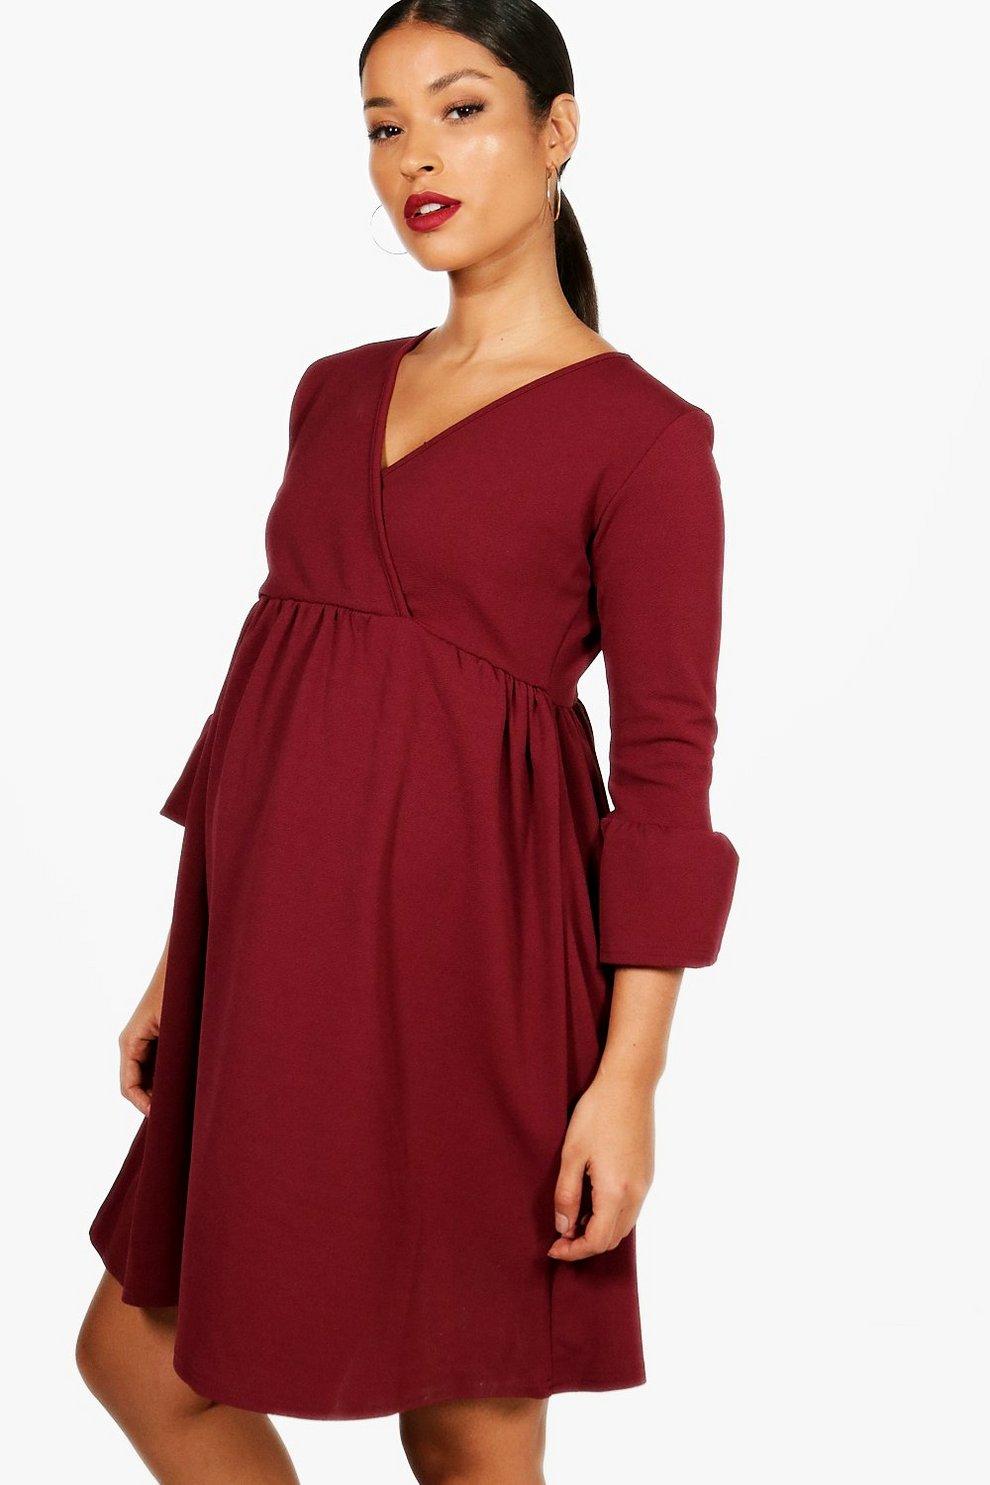 Boohoo Maternity Crepe Ruffle Smock Dress Factory Price 2018 New Sale Online Inexpensive 7yQiA1